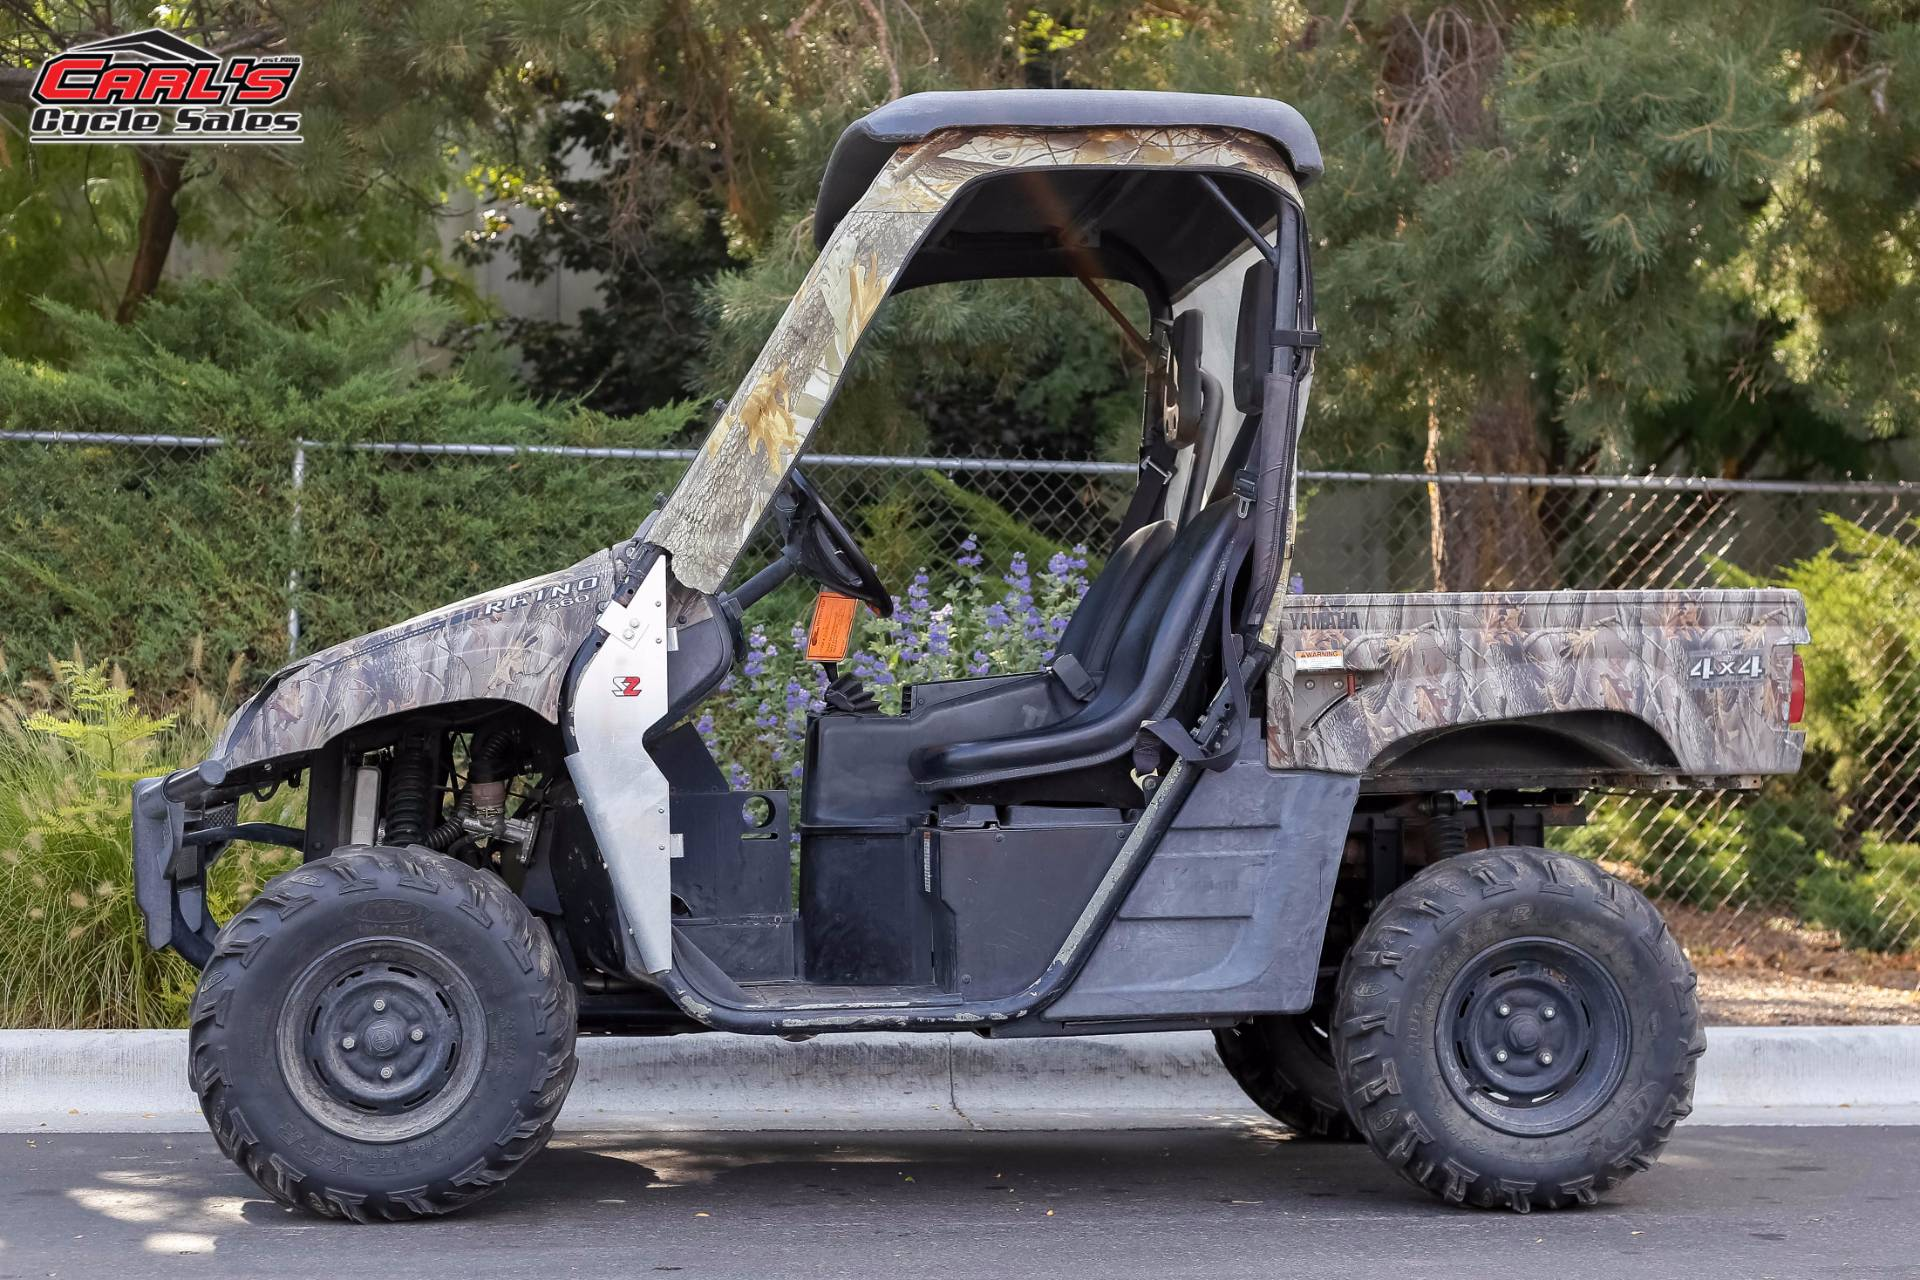 2005 Rhino 660